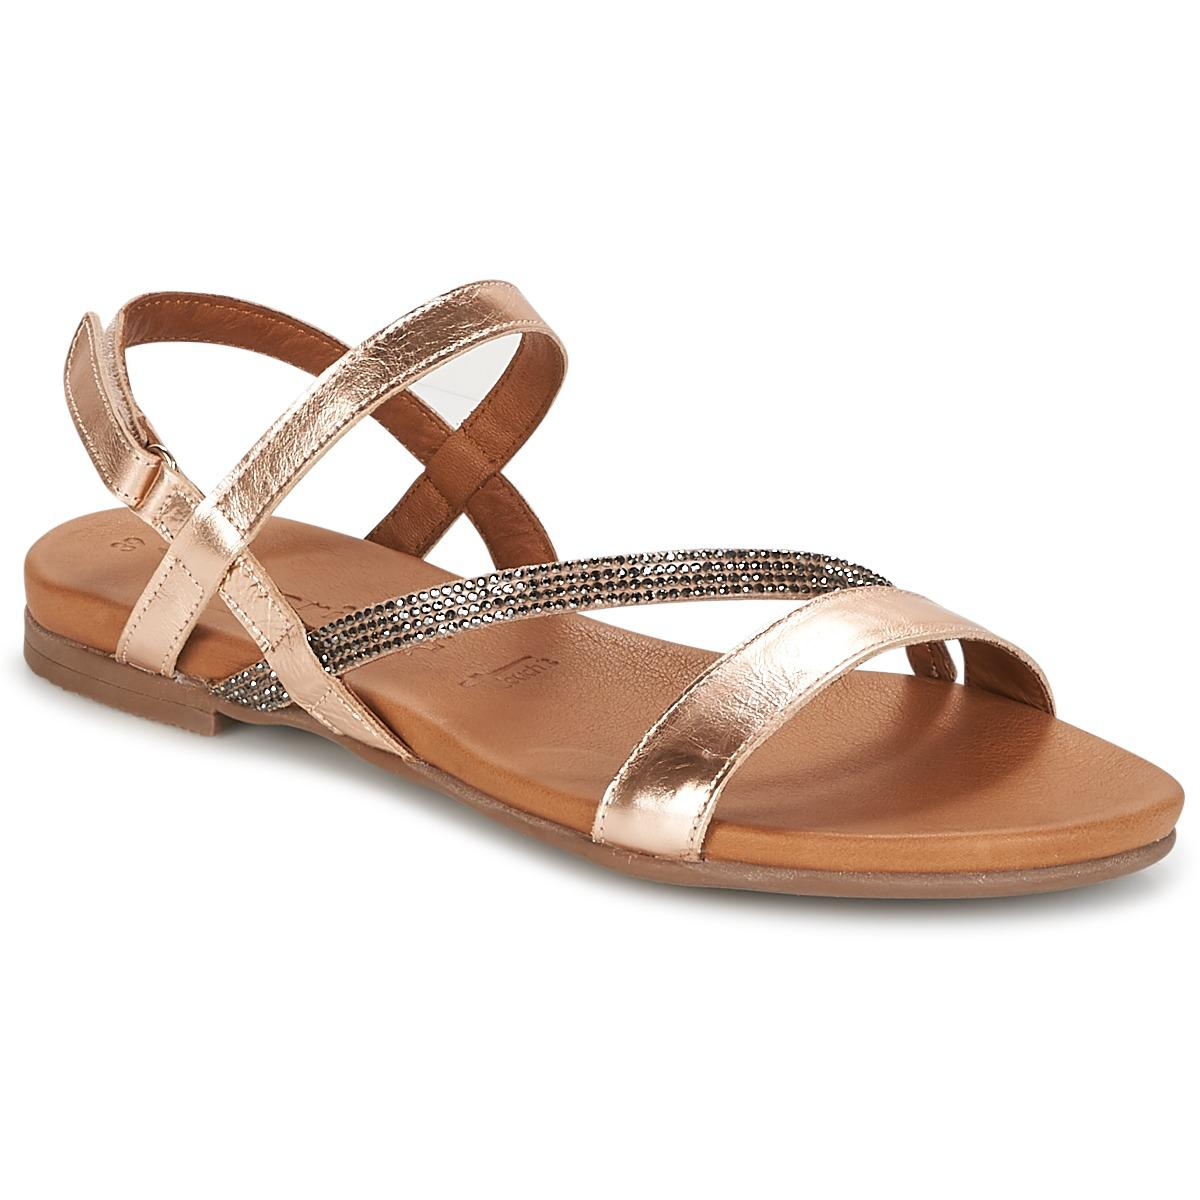 New Tamaris Gacapa Pink / Gold Sandals for Women Online Sale